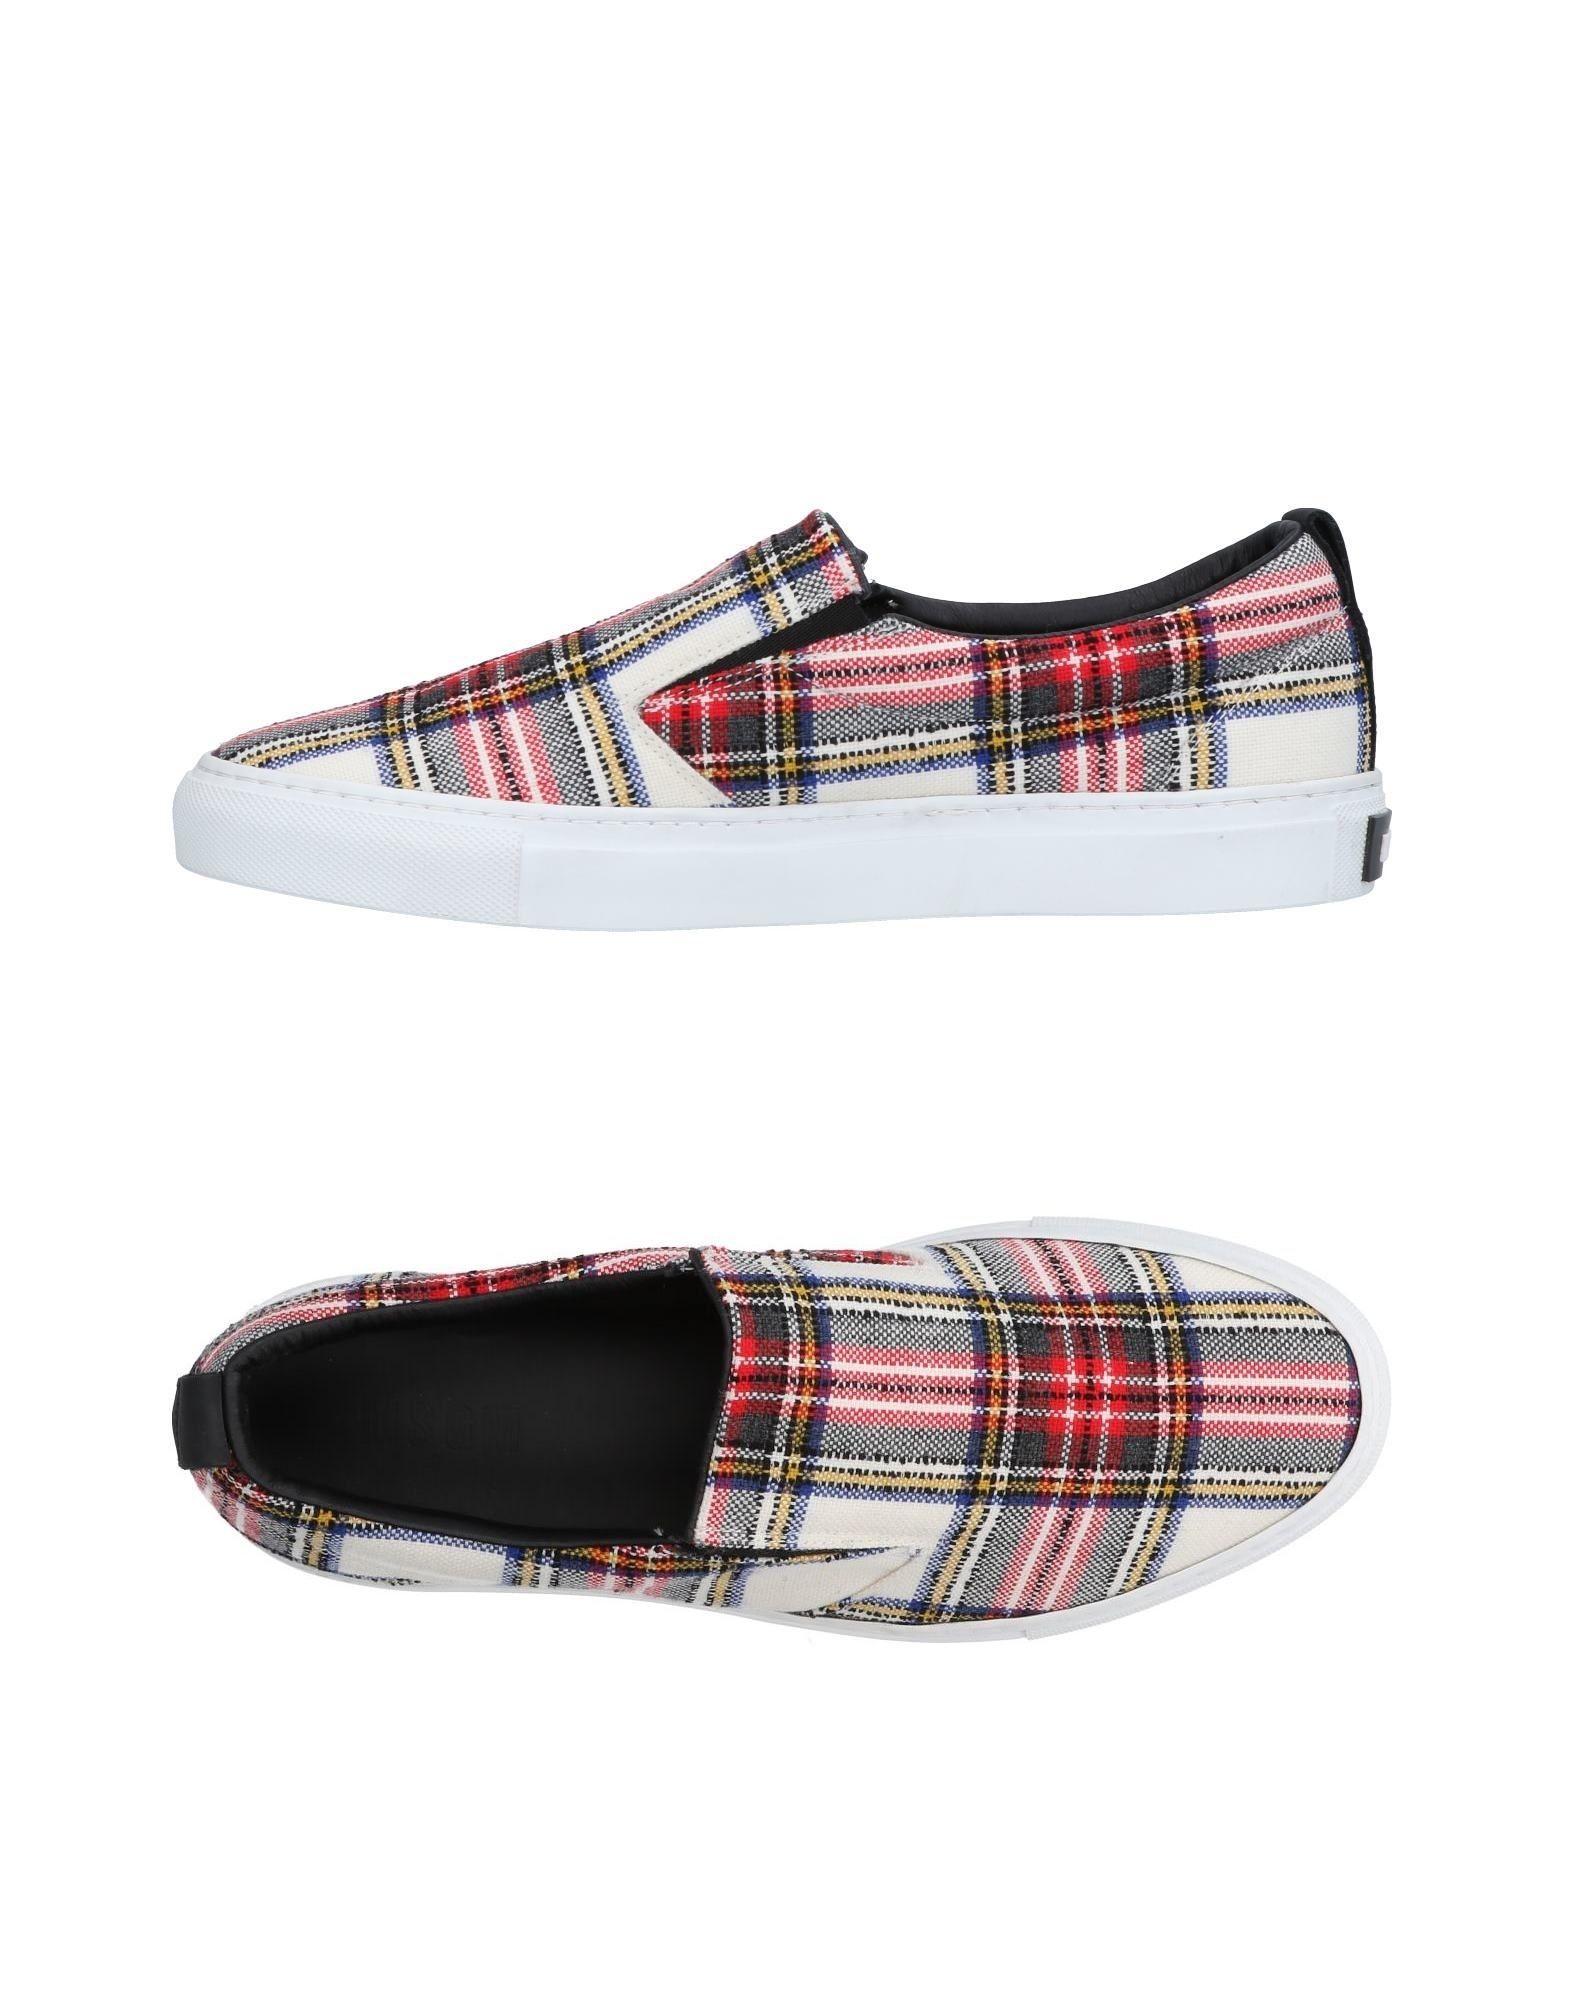 Rabatt Schuhe echte Schuhe Rabatt Msgm Turnschuhes Herren 11494945RA 24f7b2